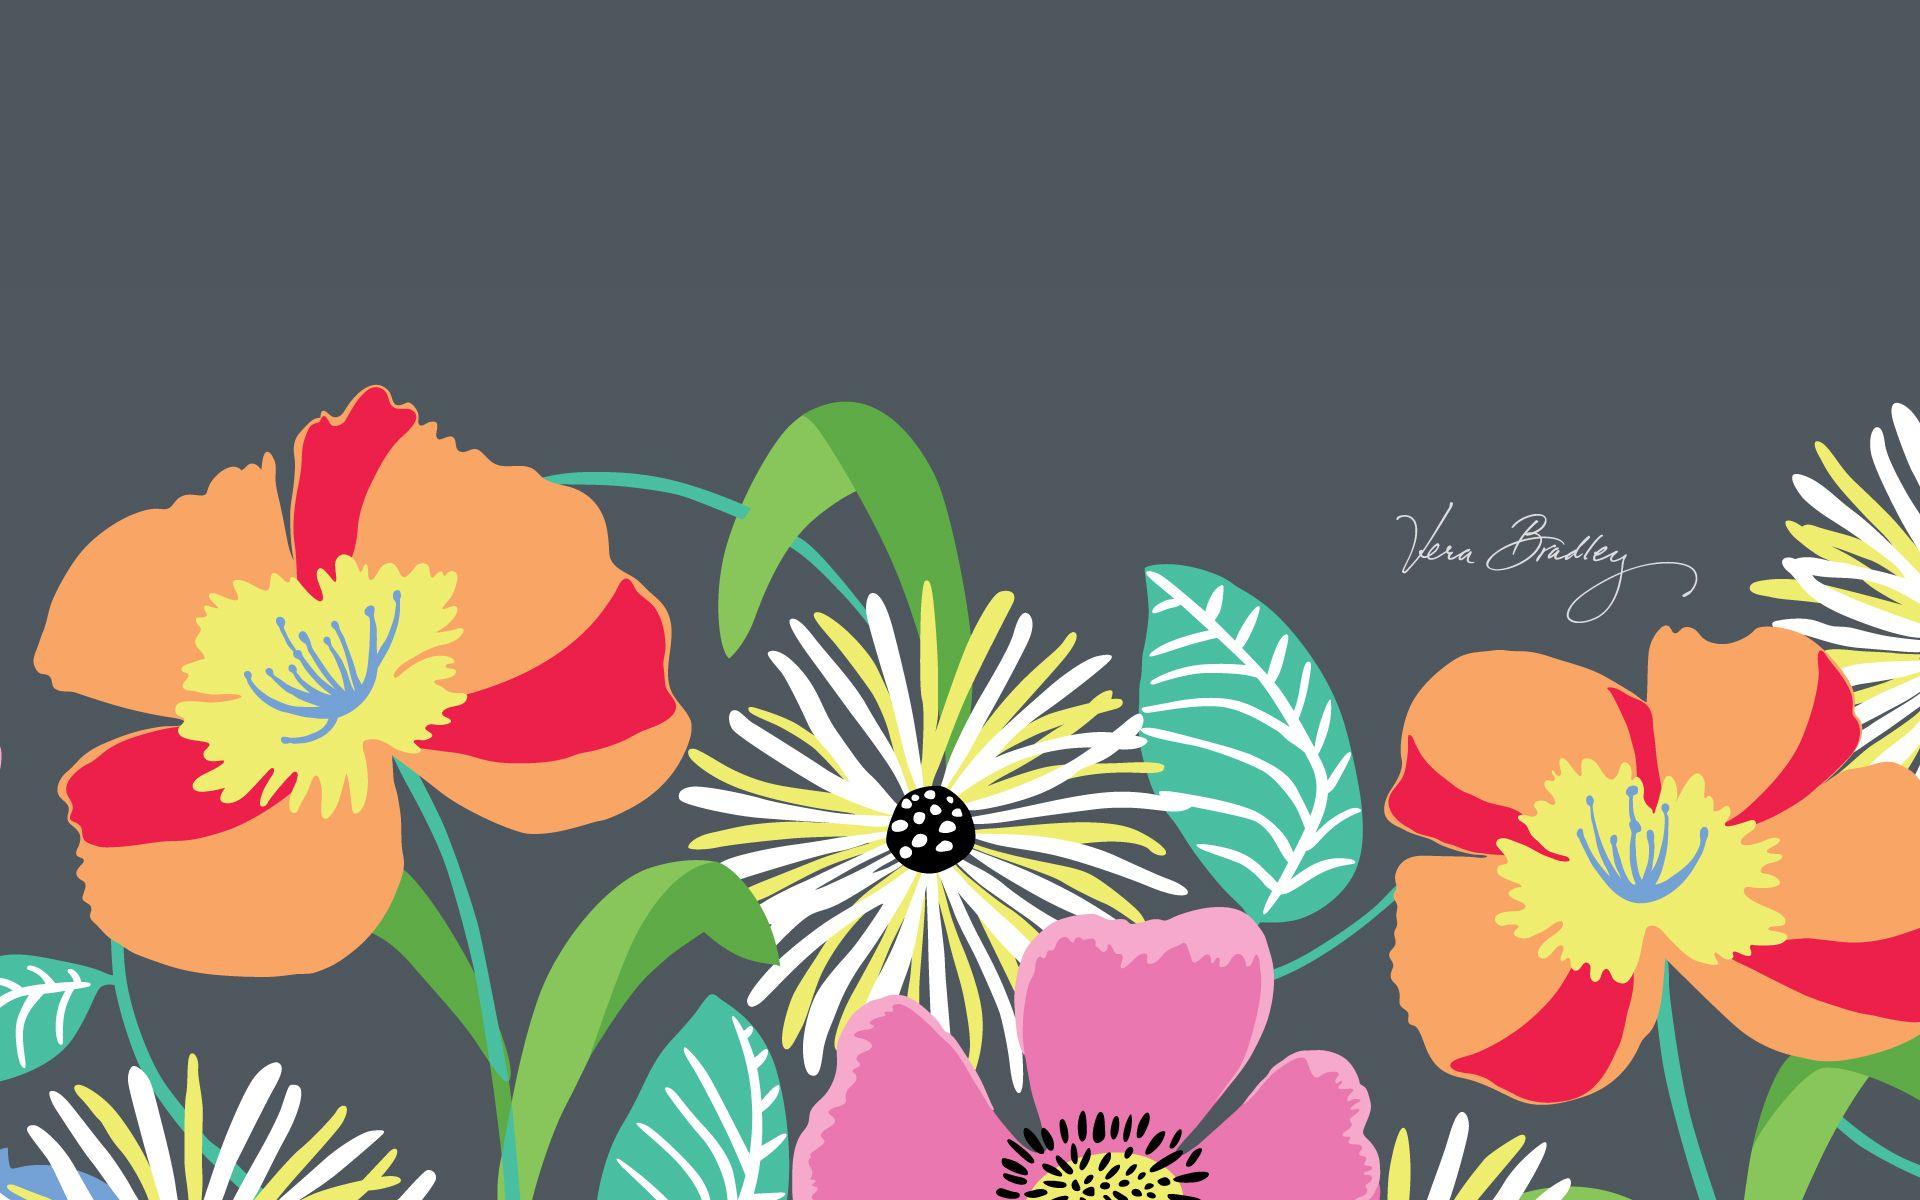 Jazzy Blooms By Vera Bradley My New Favorite Print Vera Bradley Wallpaper Ipad Wallpaper Print Design Pattern